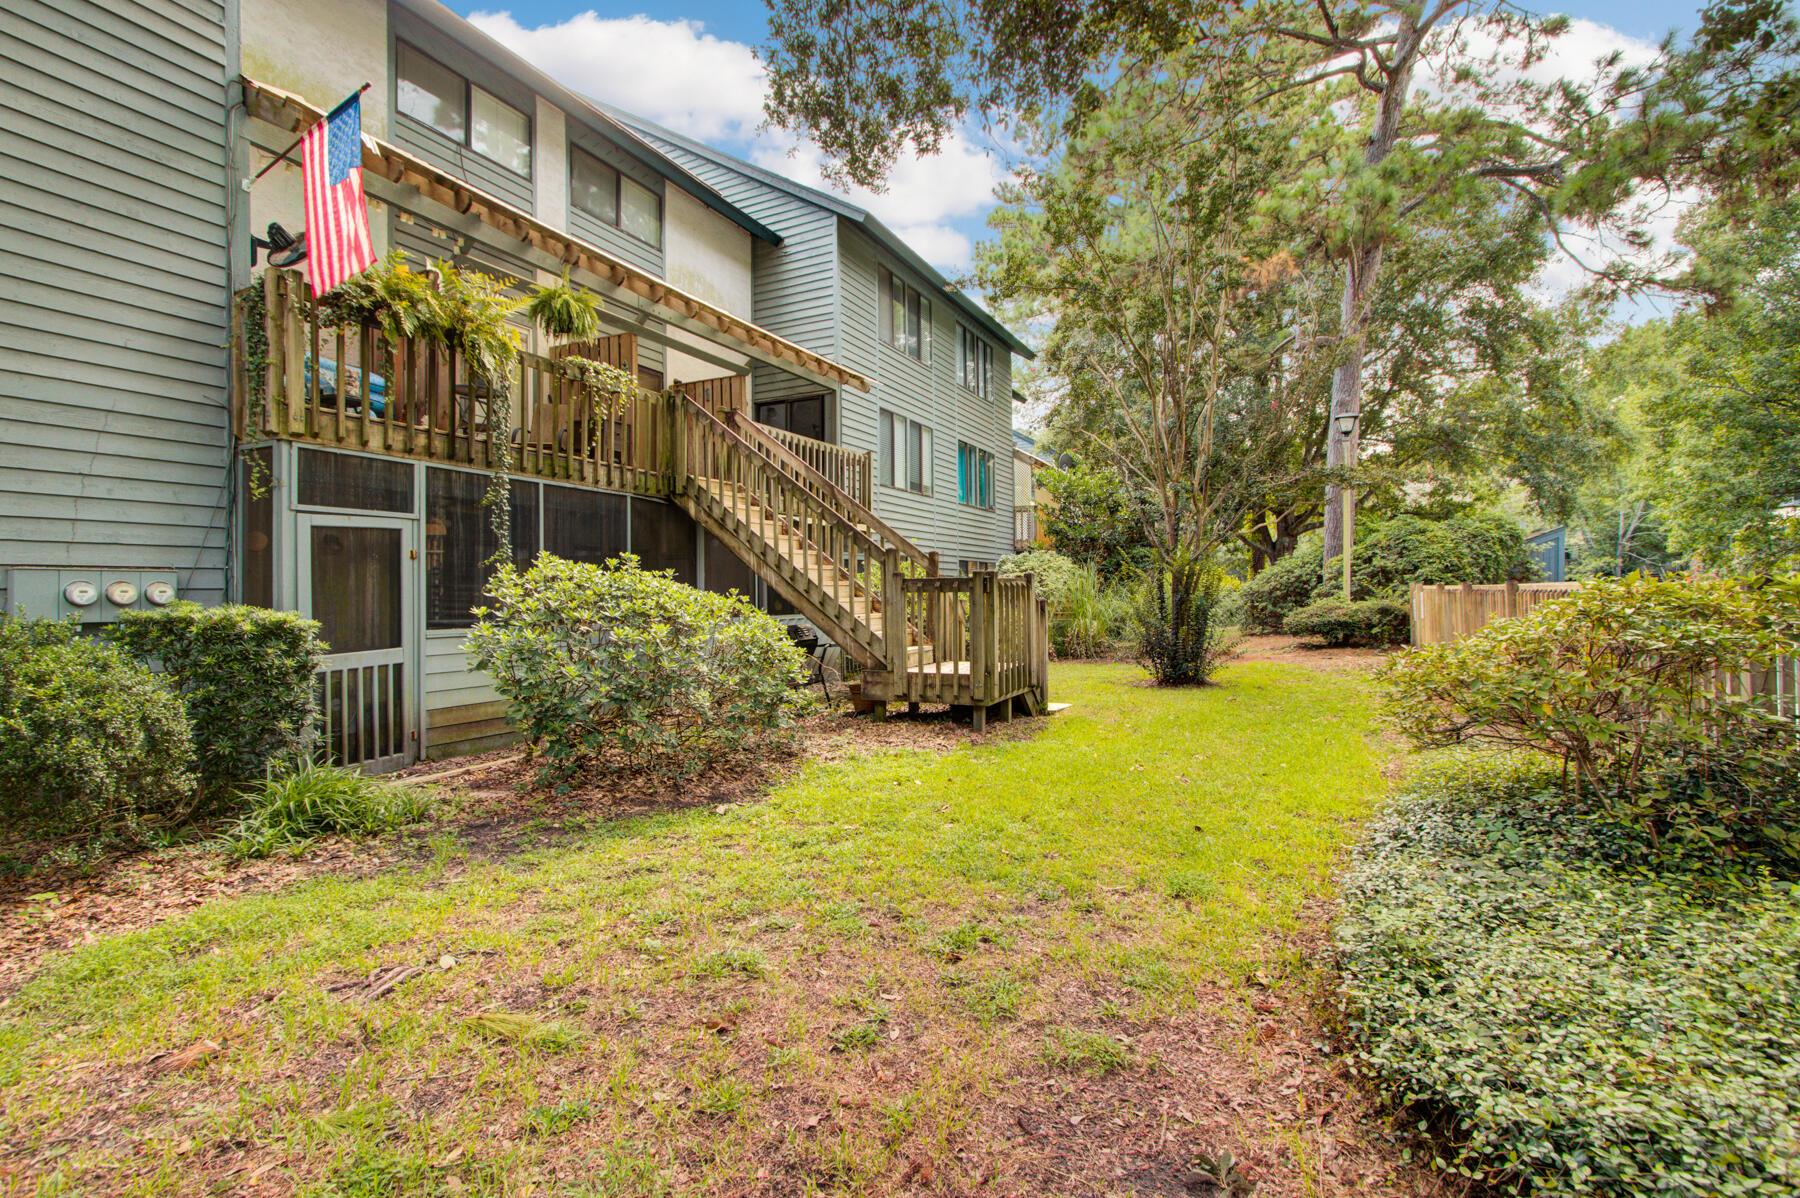 Snee Farm Lakes Homes For Sale - 1120 Hidden Cove, Mount Pleasant, SC - 19